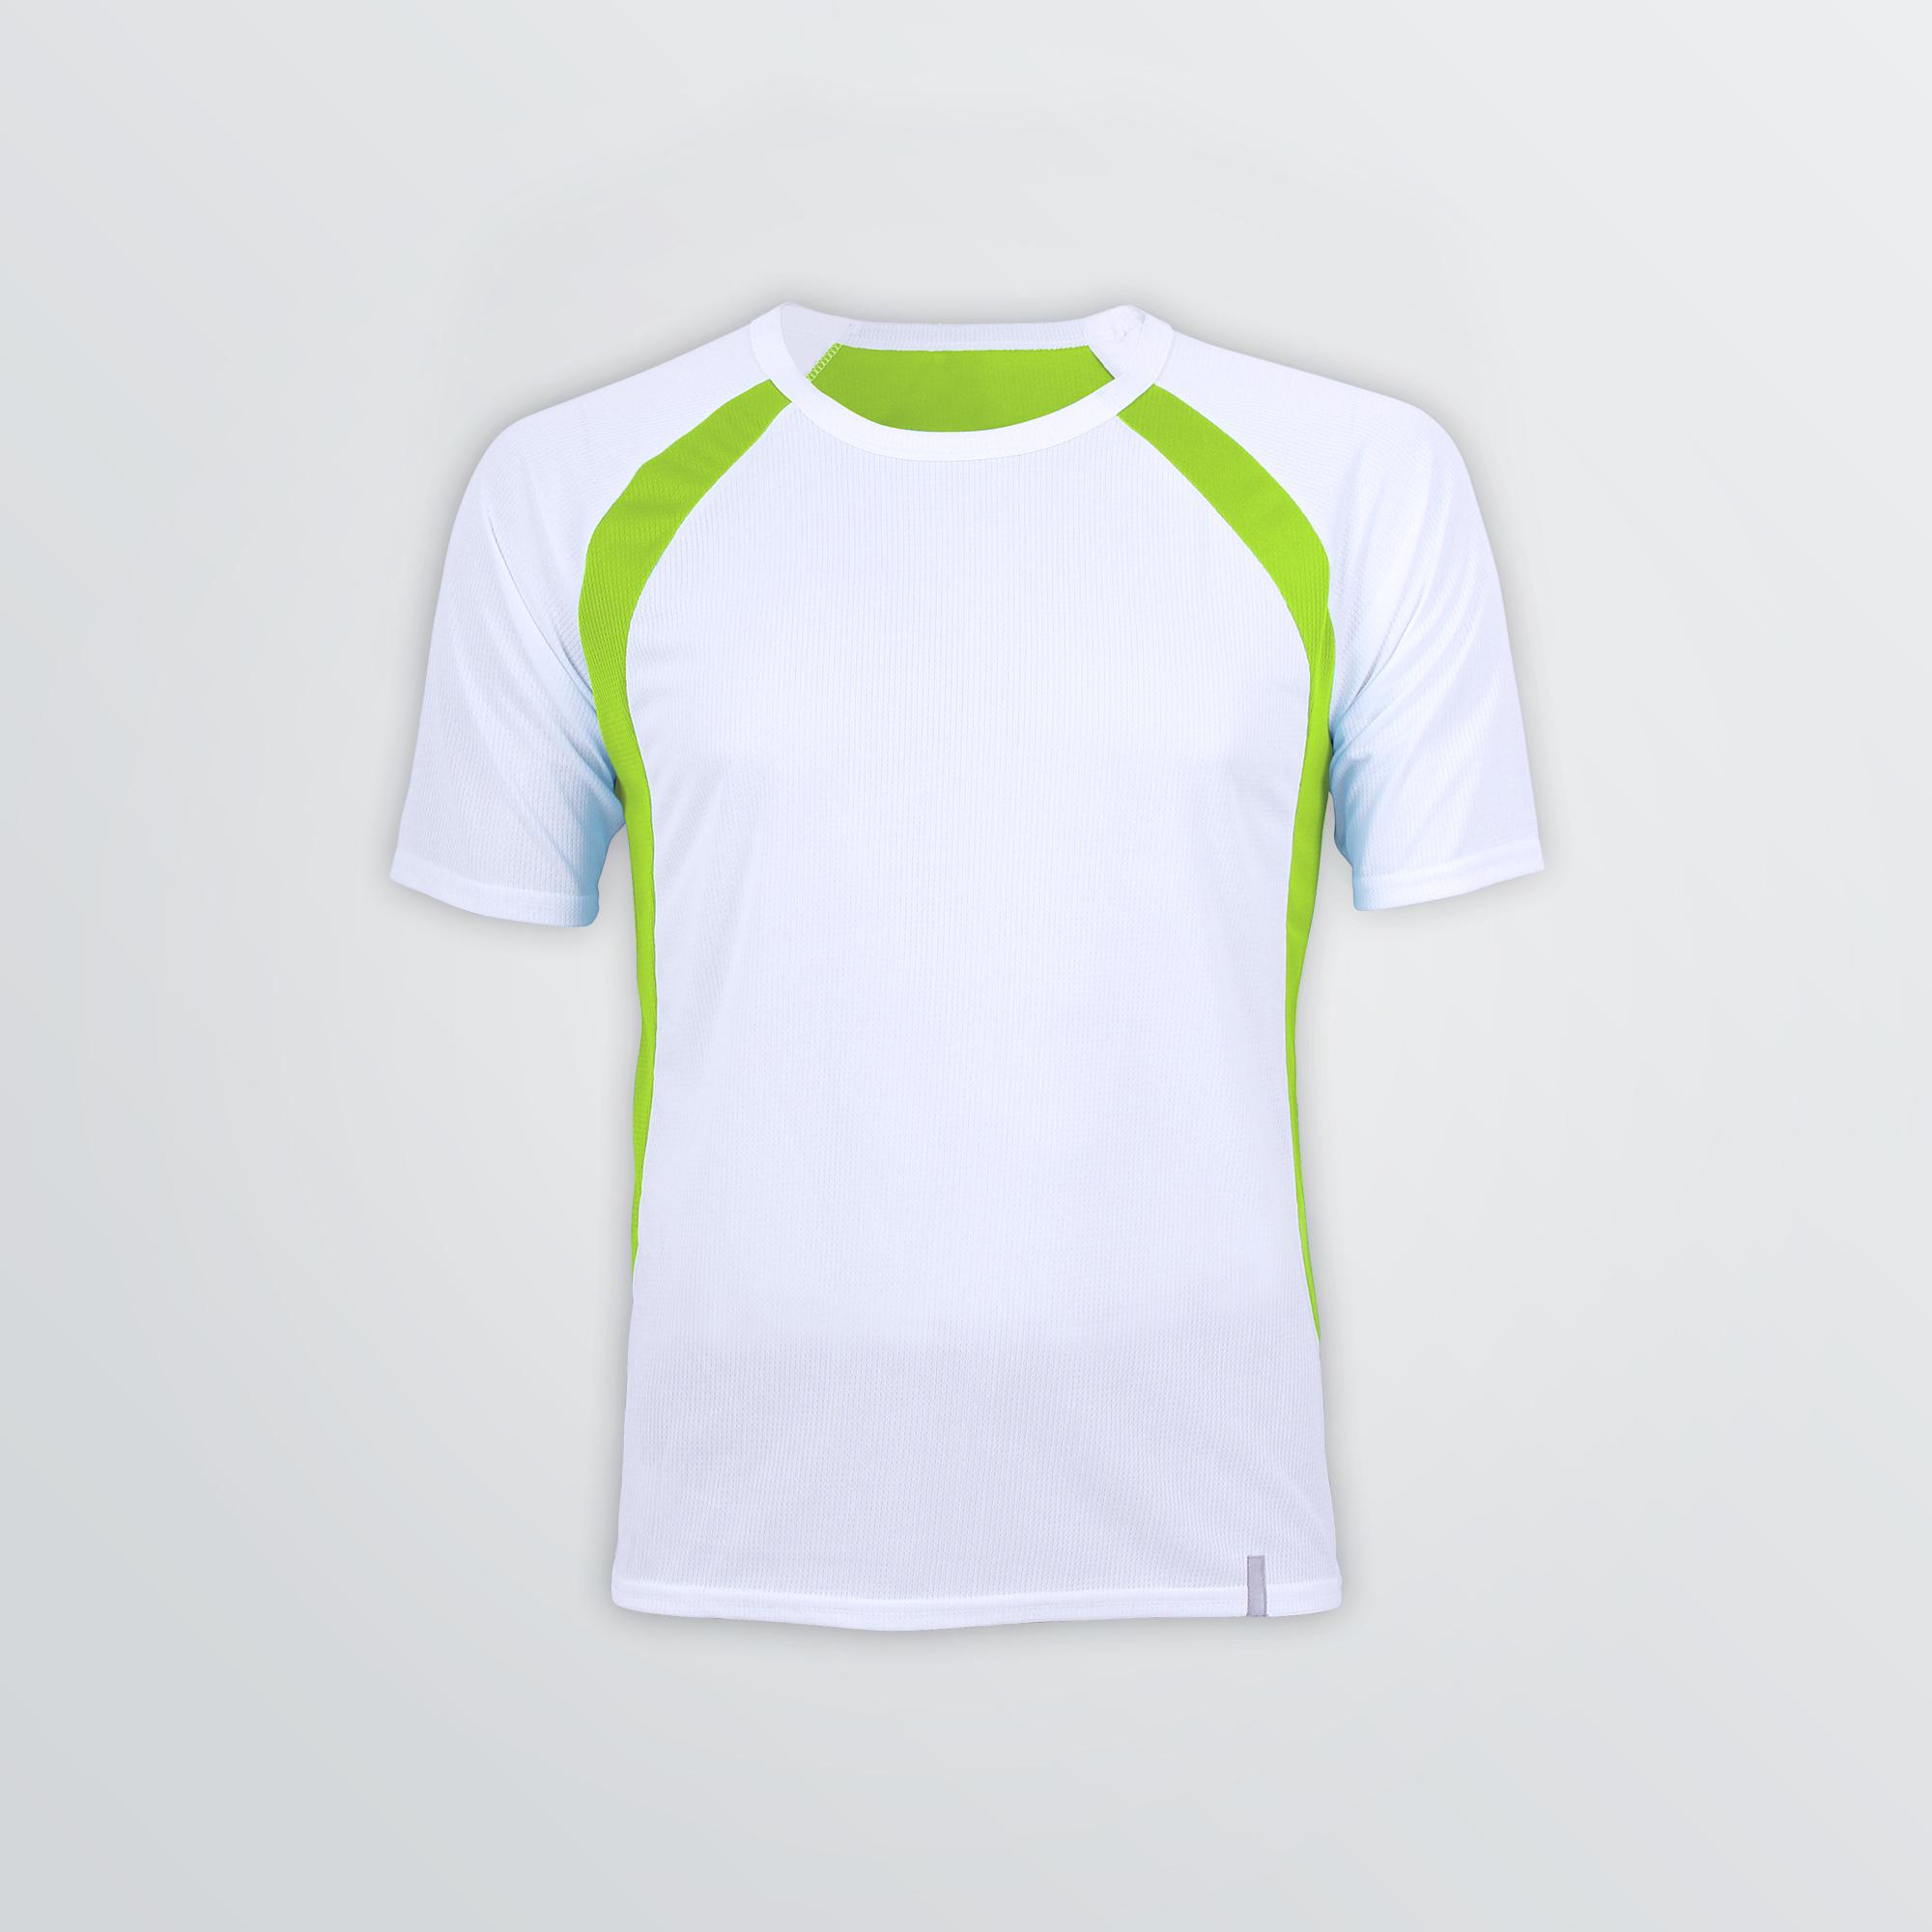 Pace-Tech-Shirt